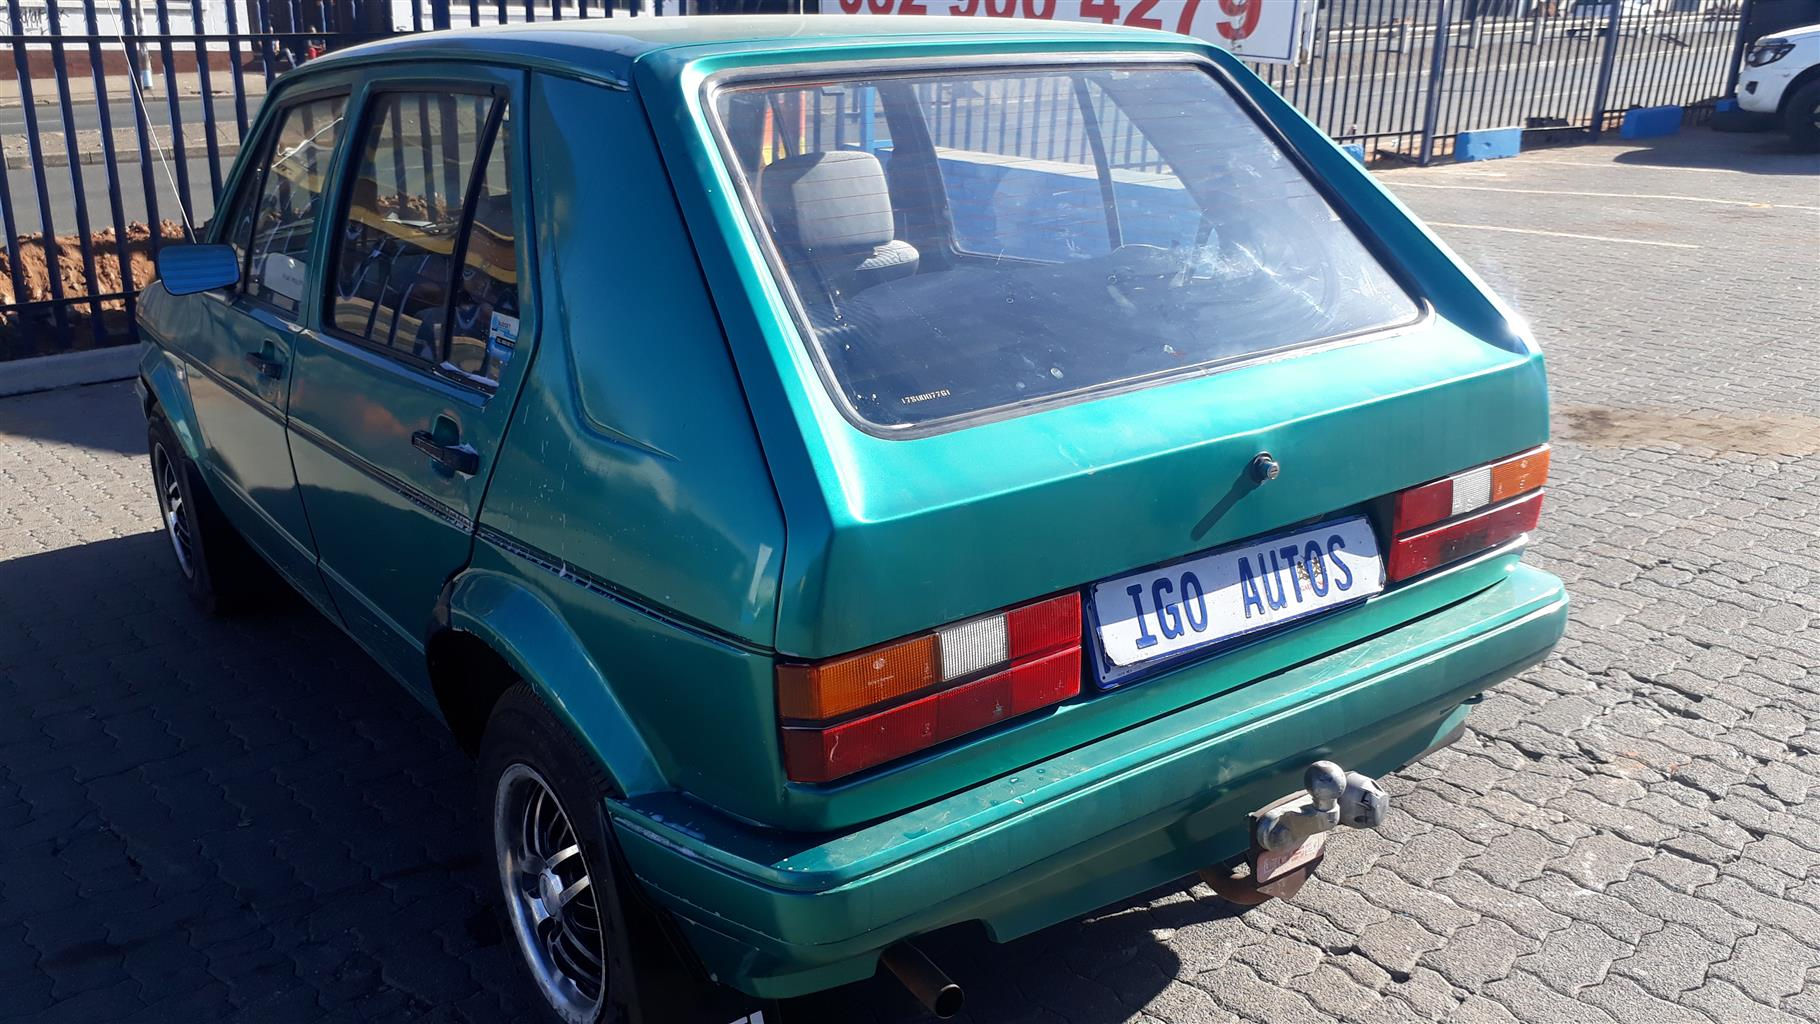 1995 VW Citi CITI 1.6i